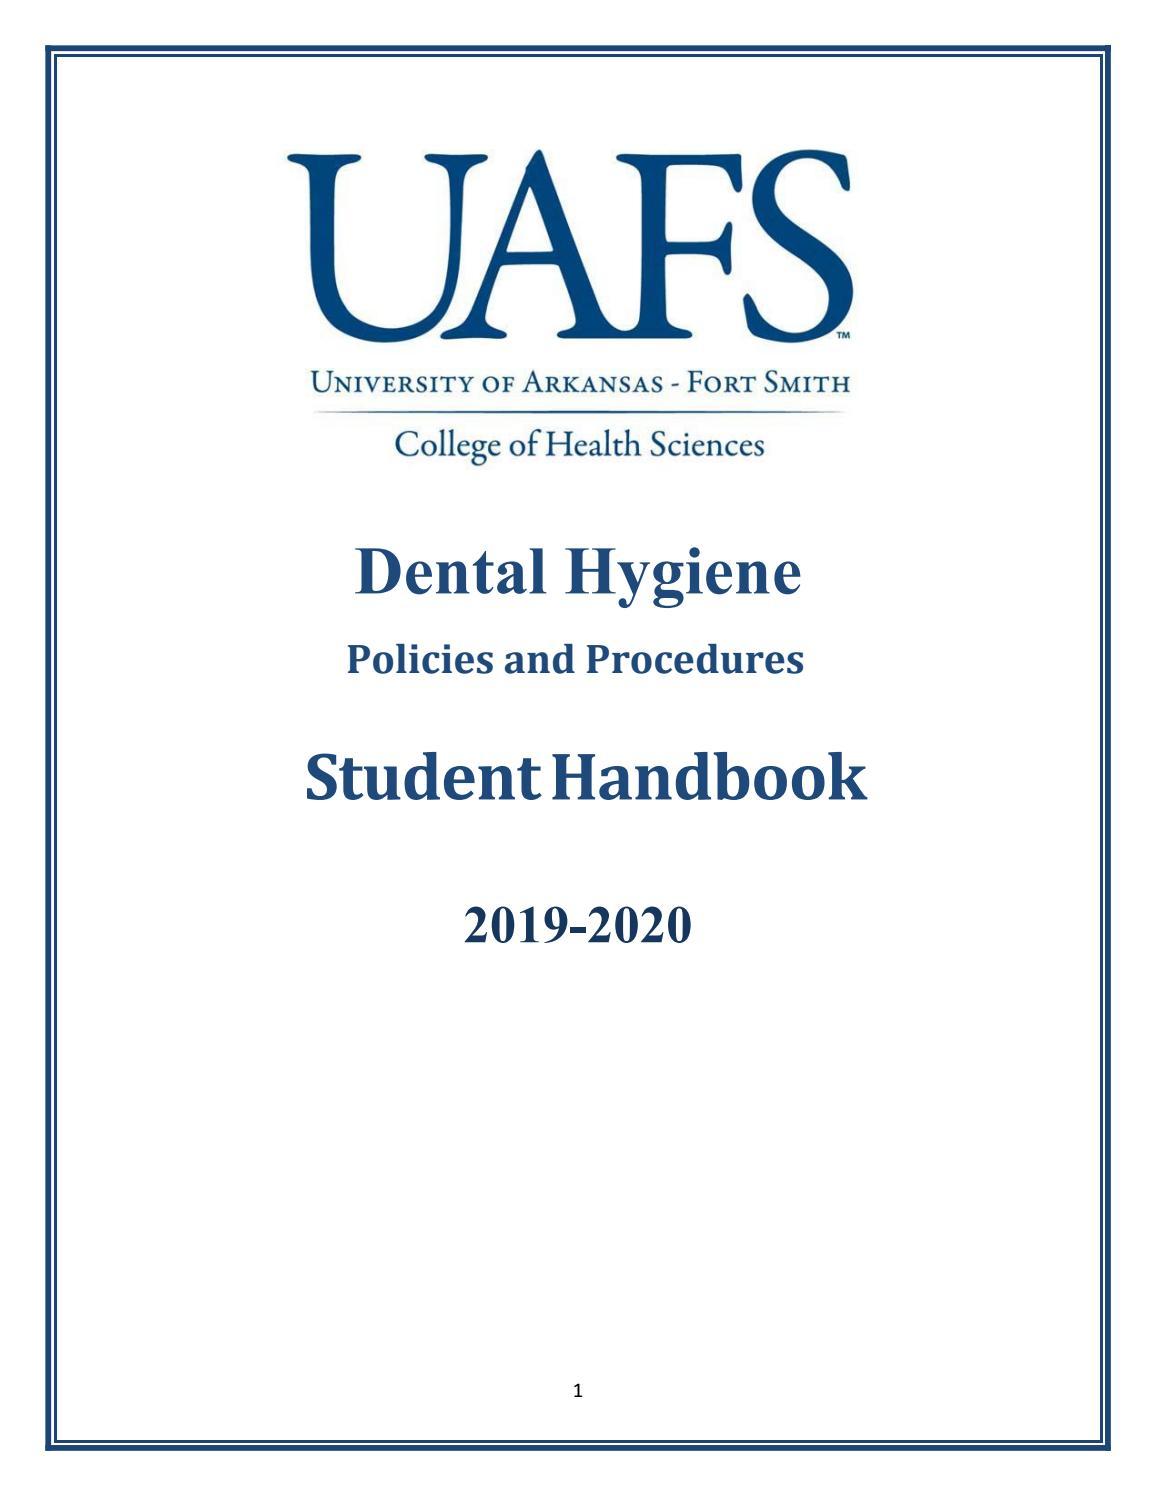 Dental Hygiene Policies & Procedures Manual by University of